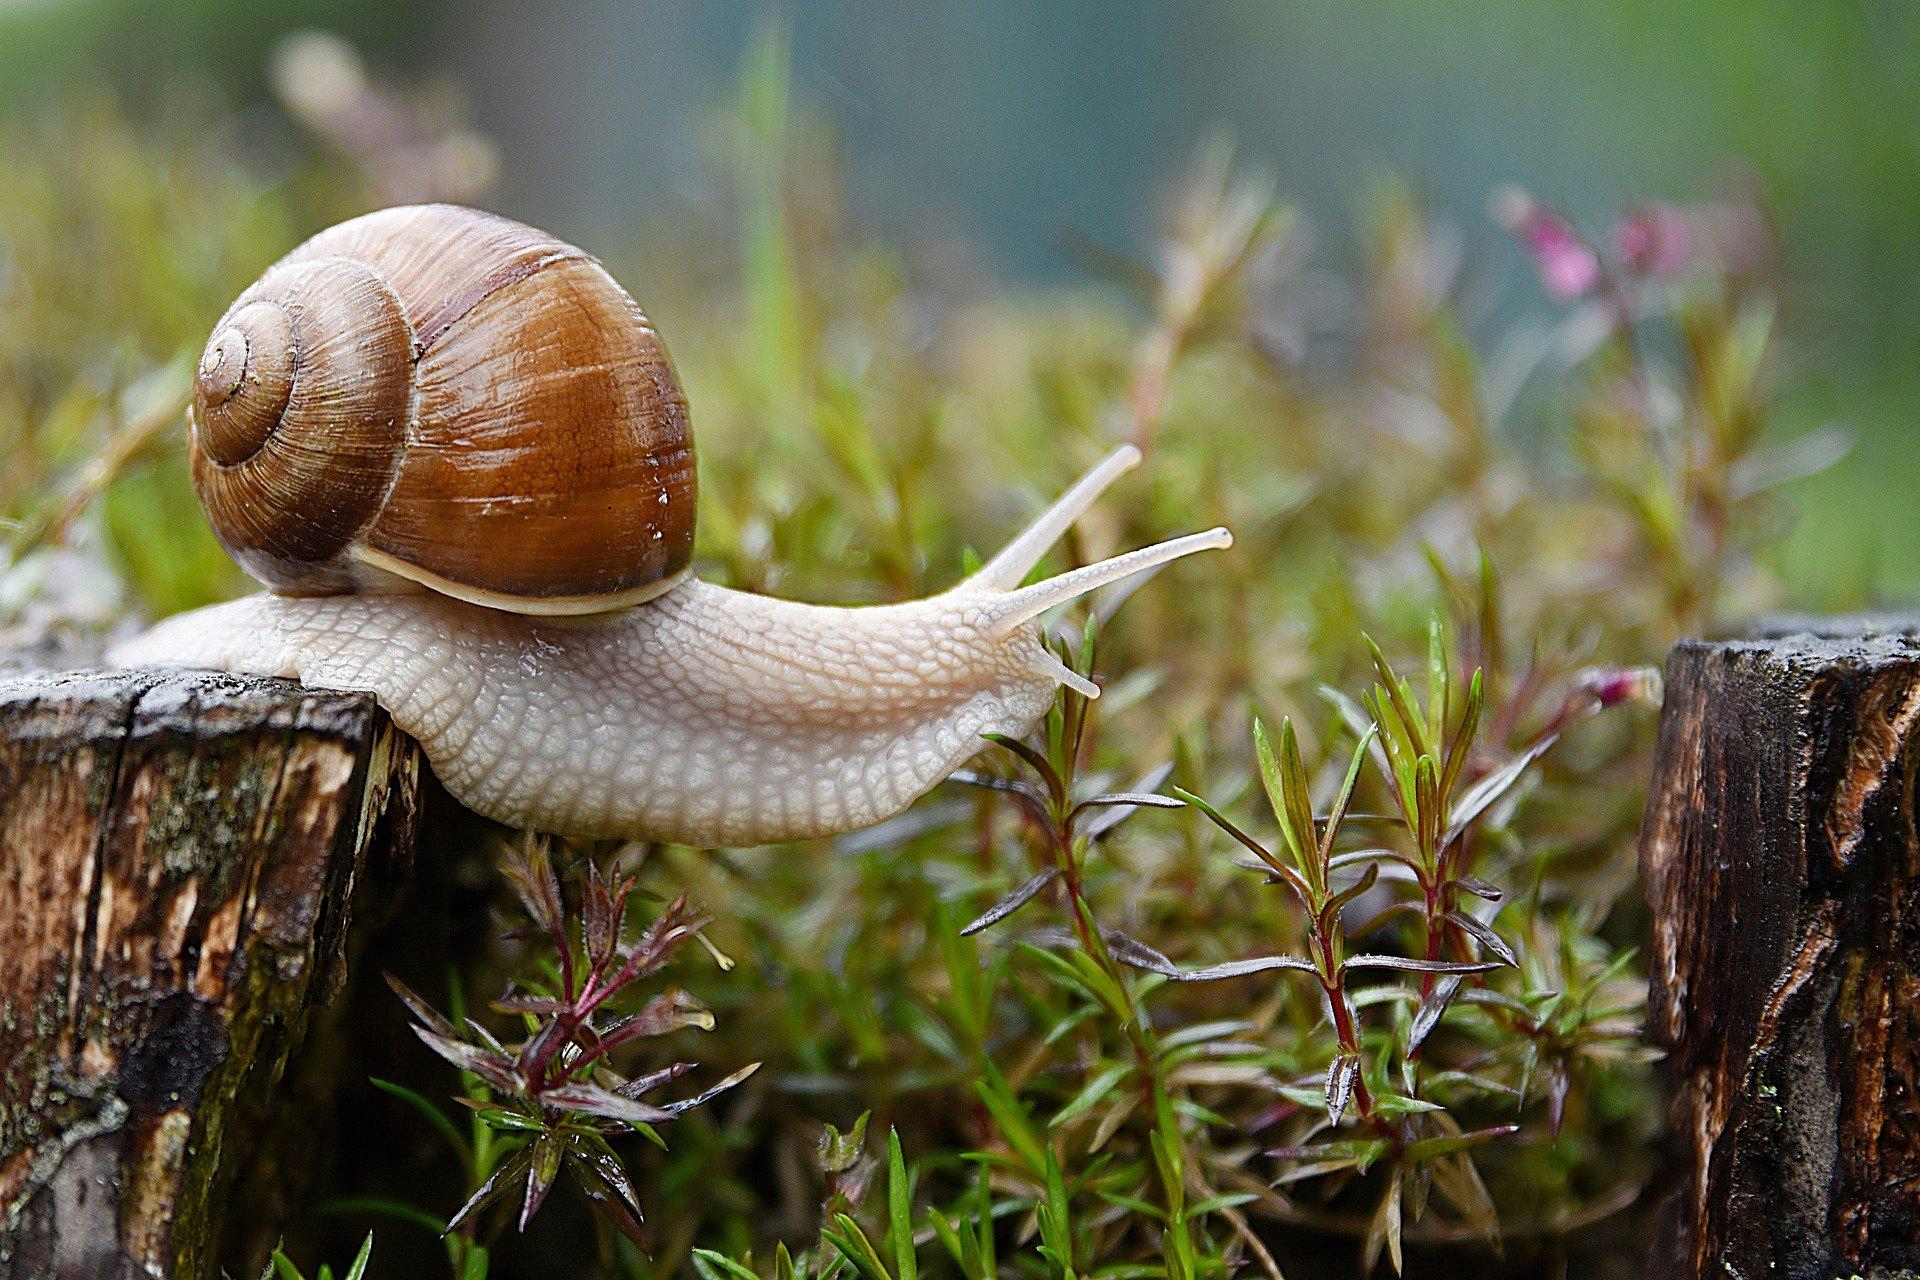 snail-ged0aa97aa_1920